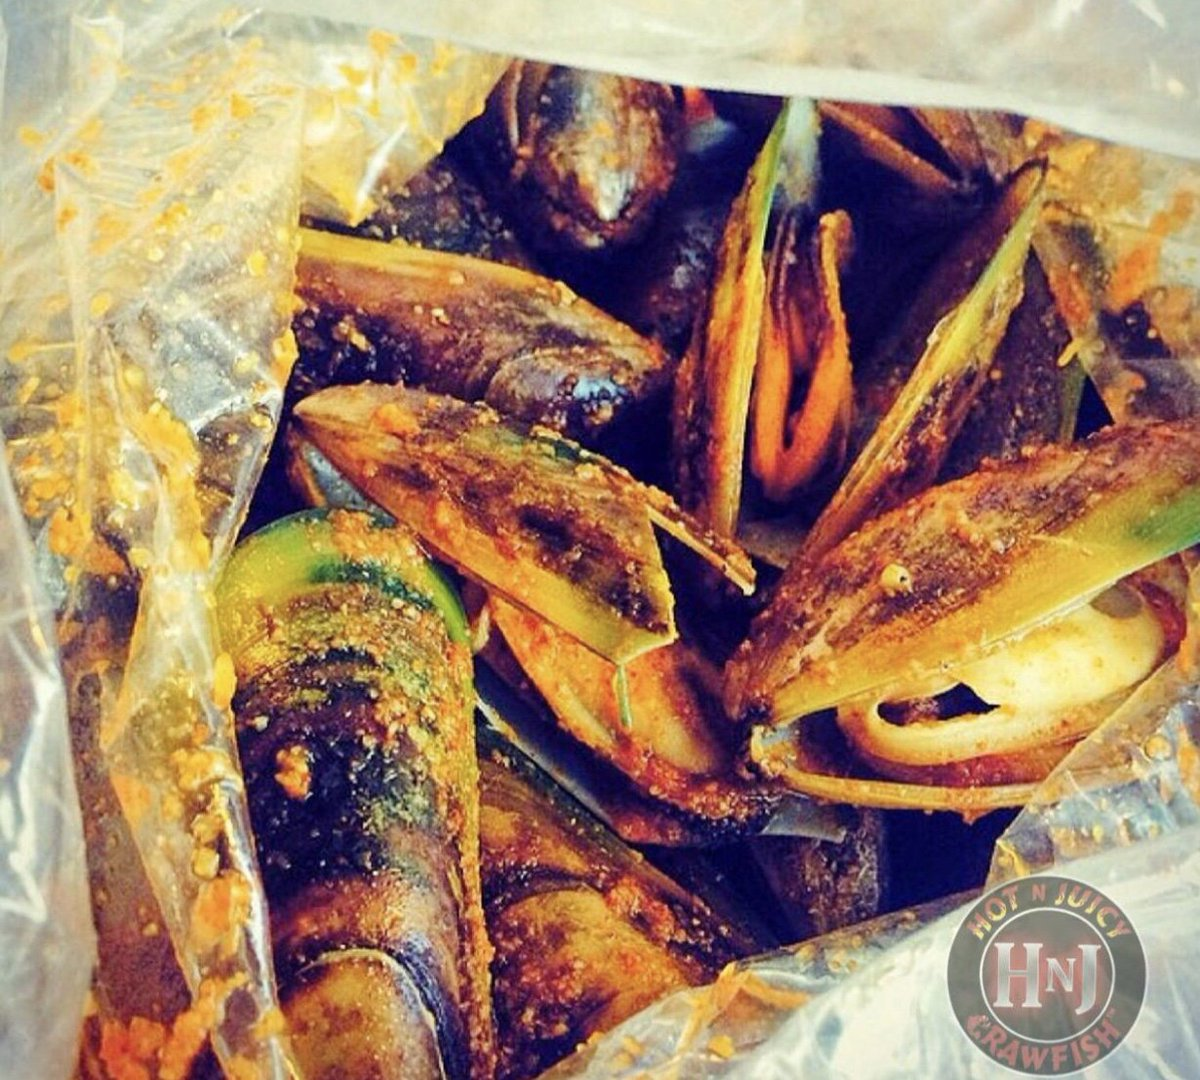 Hot N Juicy Crawfish's photo on #FridayVibes